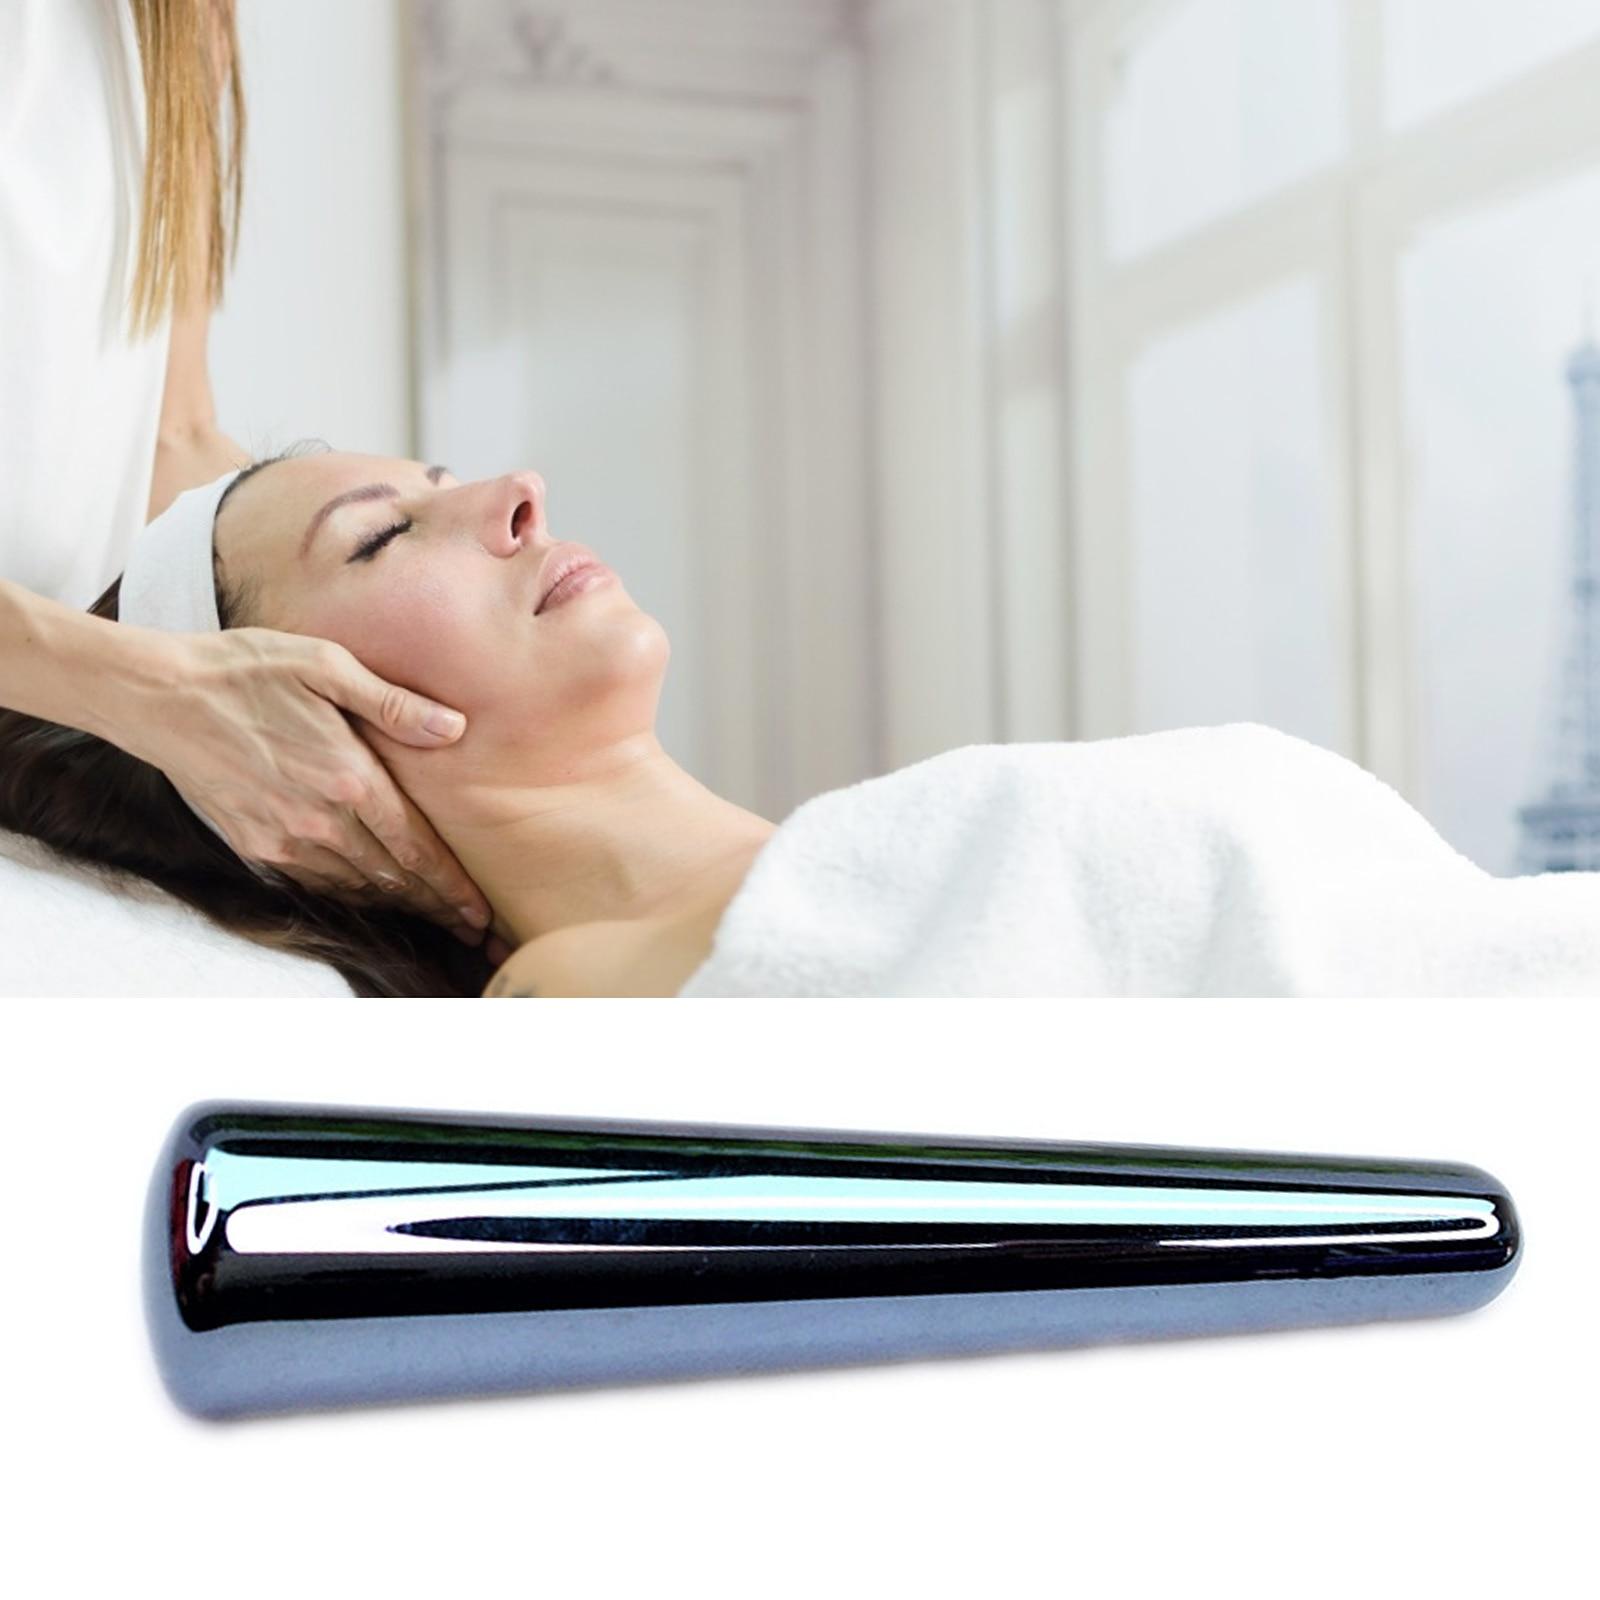 1Pcs Terahertz Energy Stone Massage Wand Face Body Acupuncture Point Massage Stick Physiotherapy Reflexology Beauty Gua Sha Tool